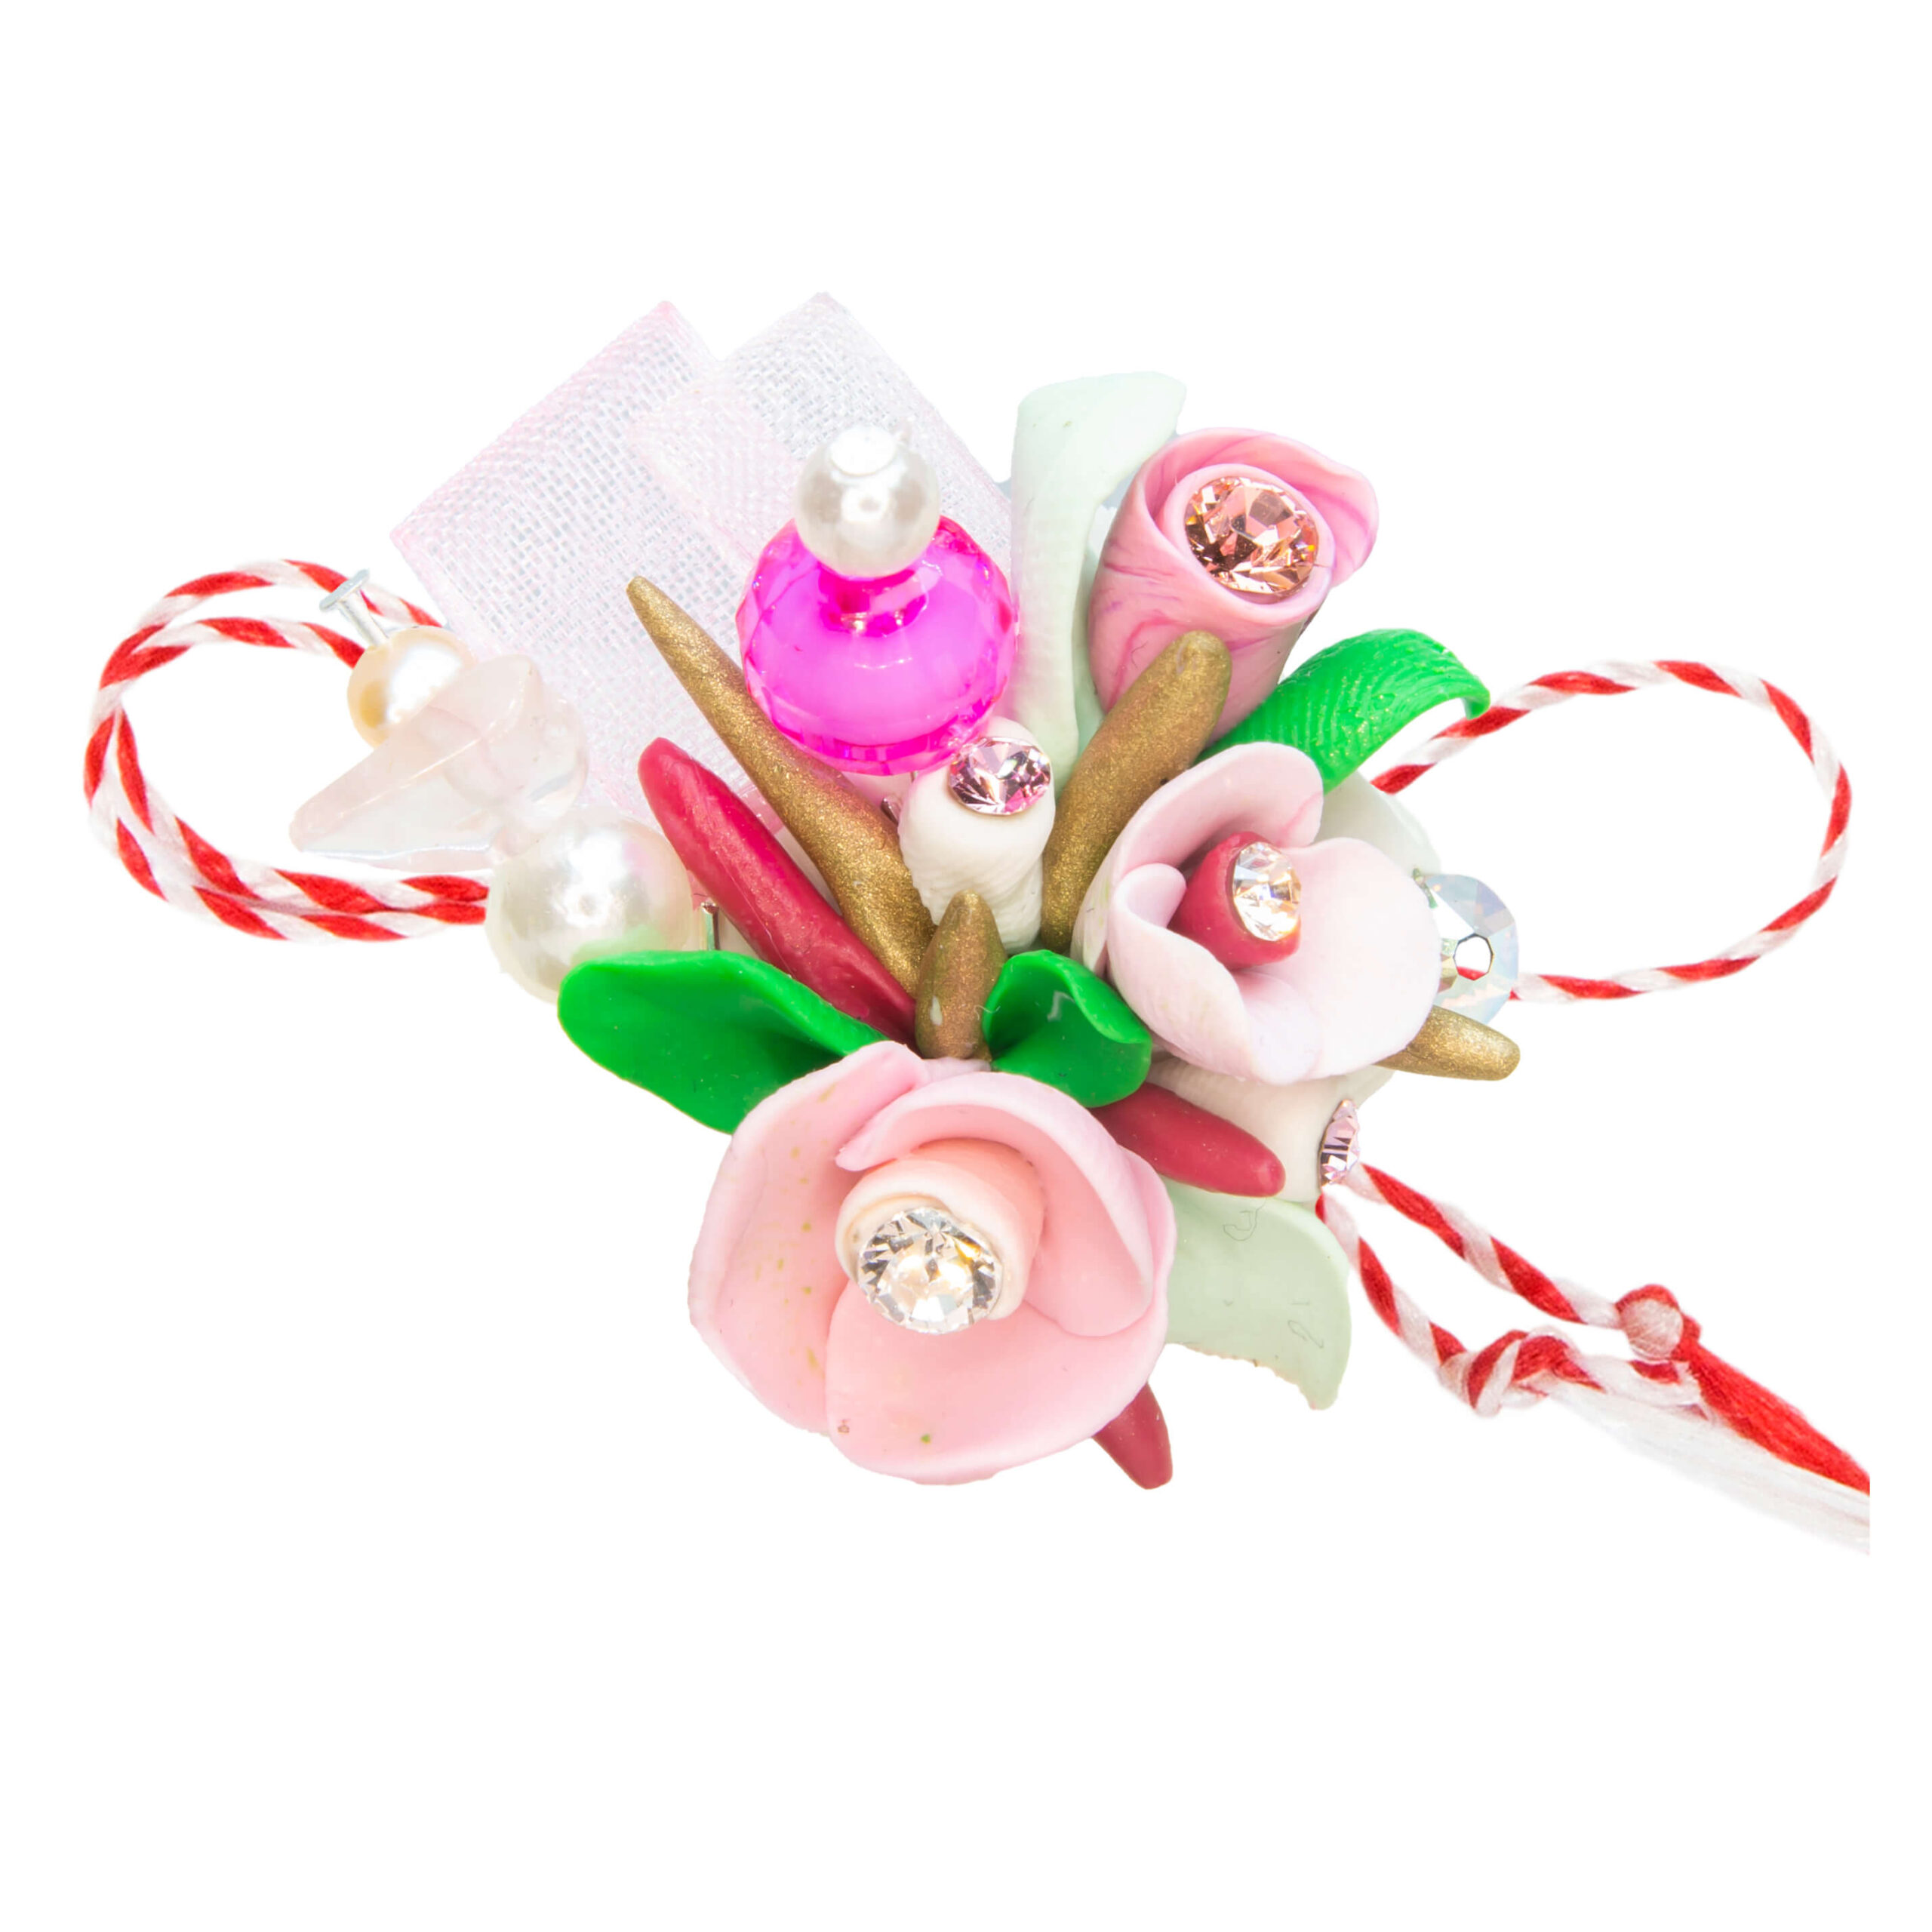 Martisor brosa buchet flori, Miidefloriart, model 70